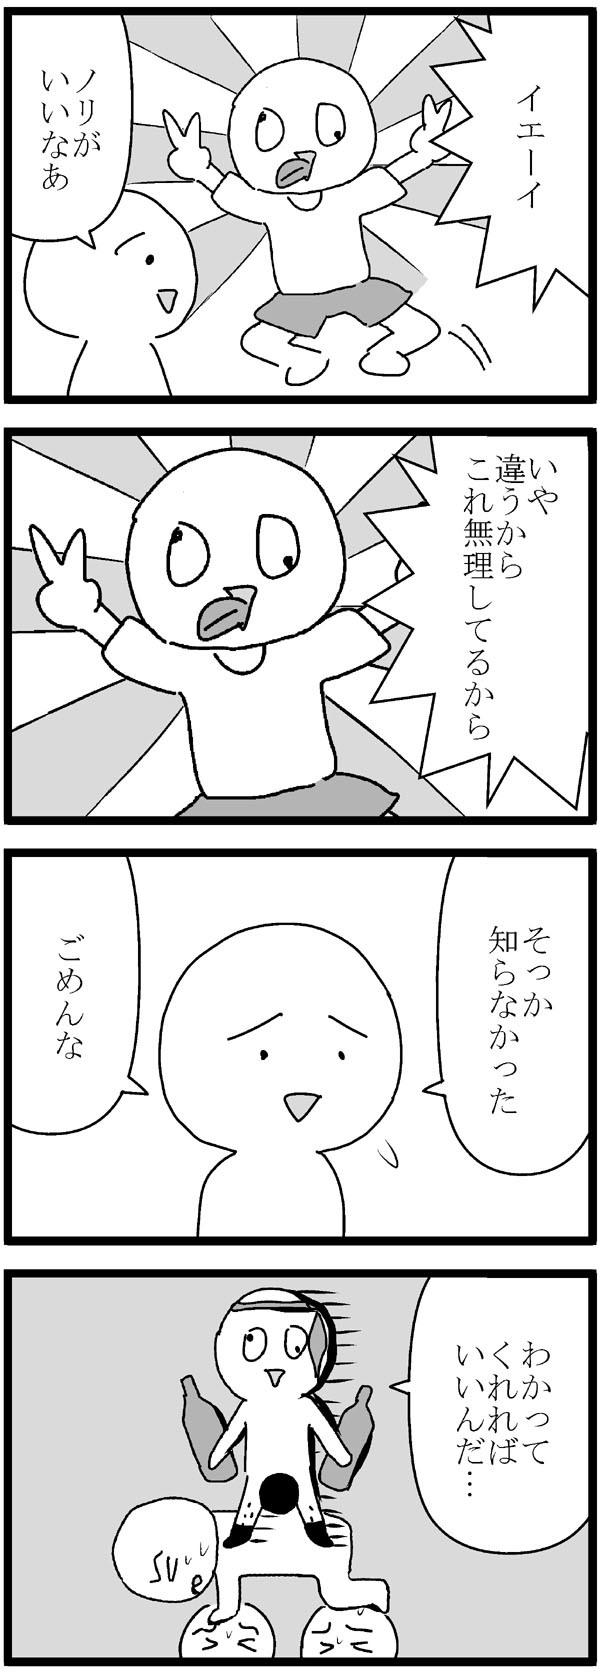 e5b2dbd6.jpg